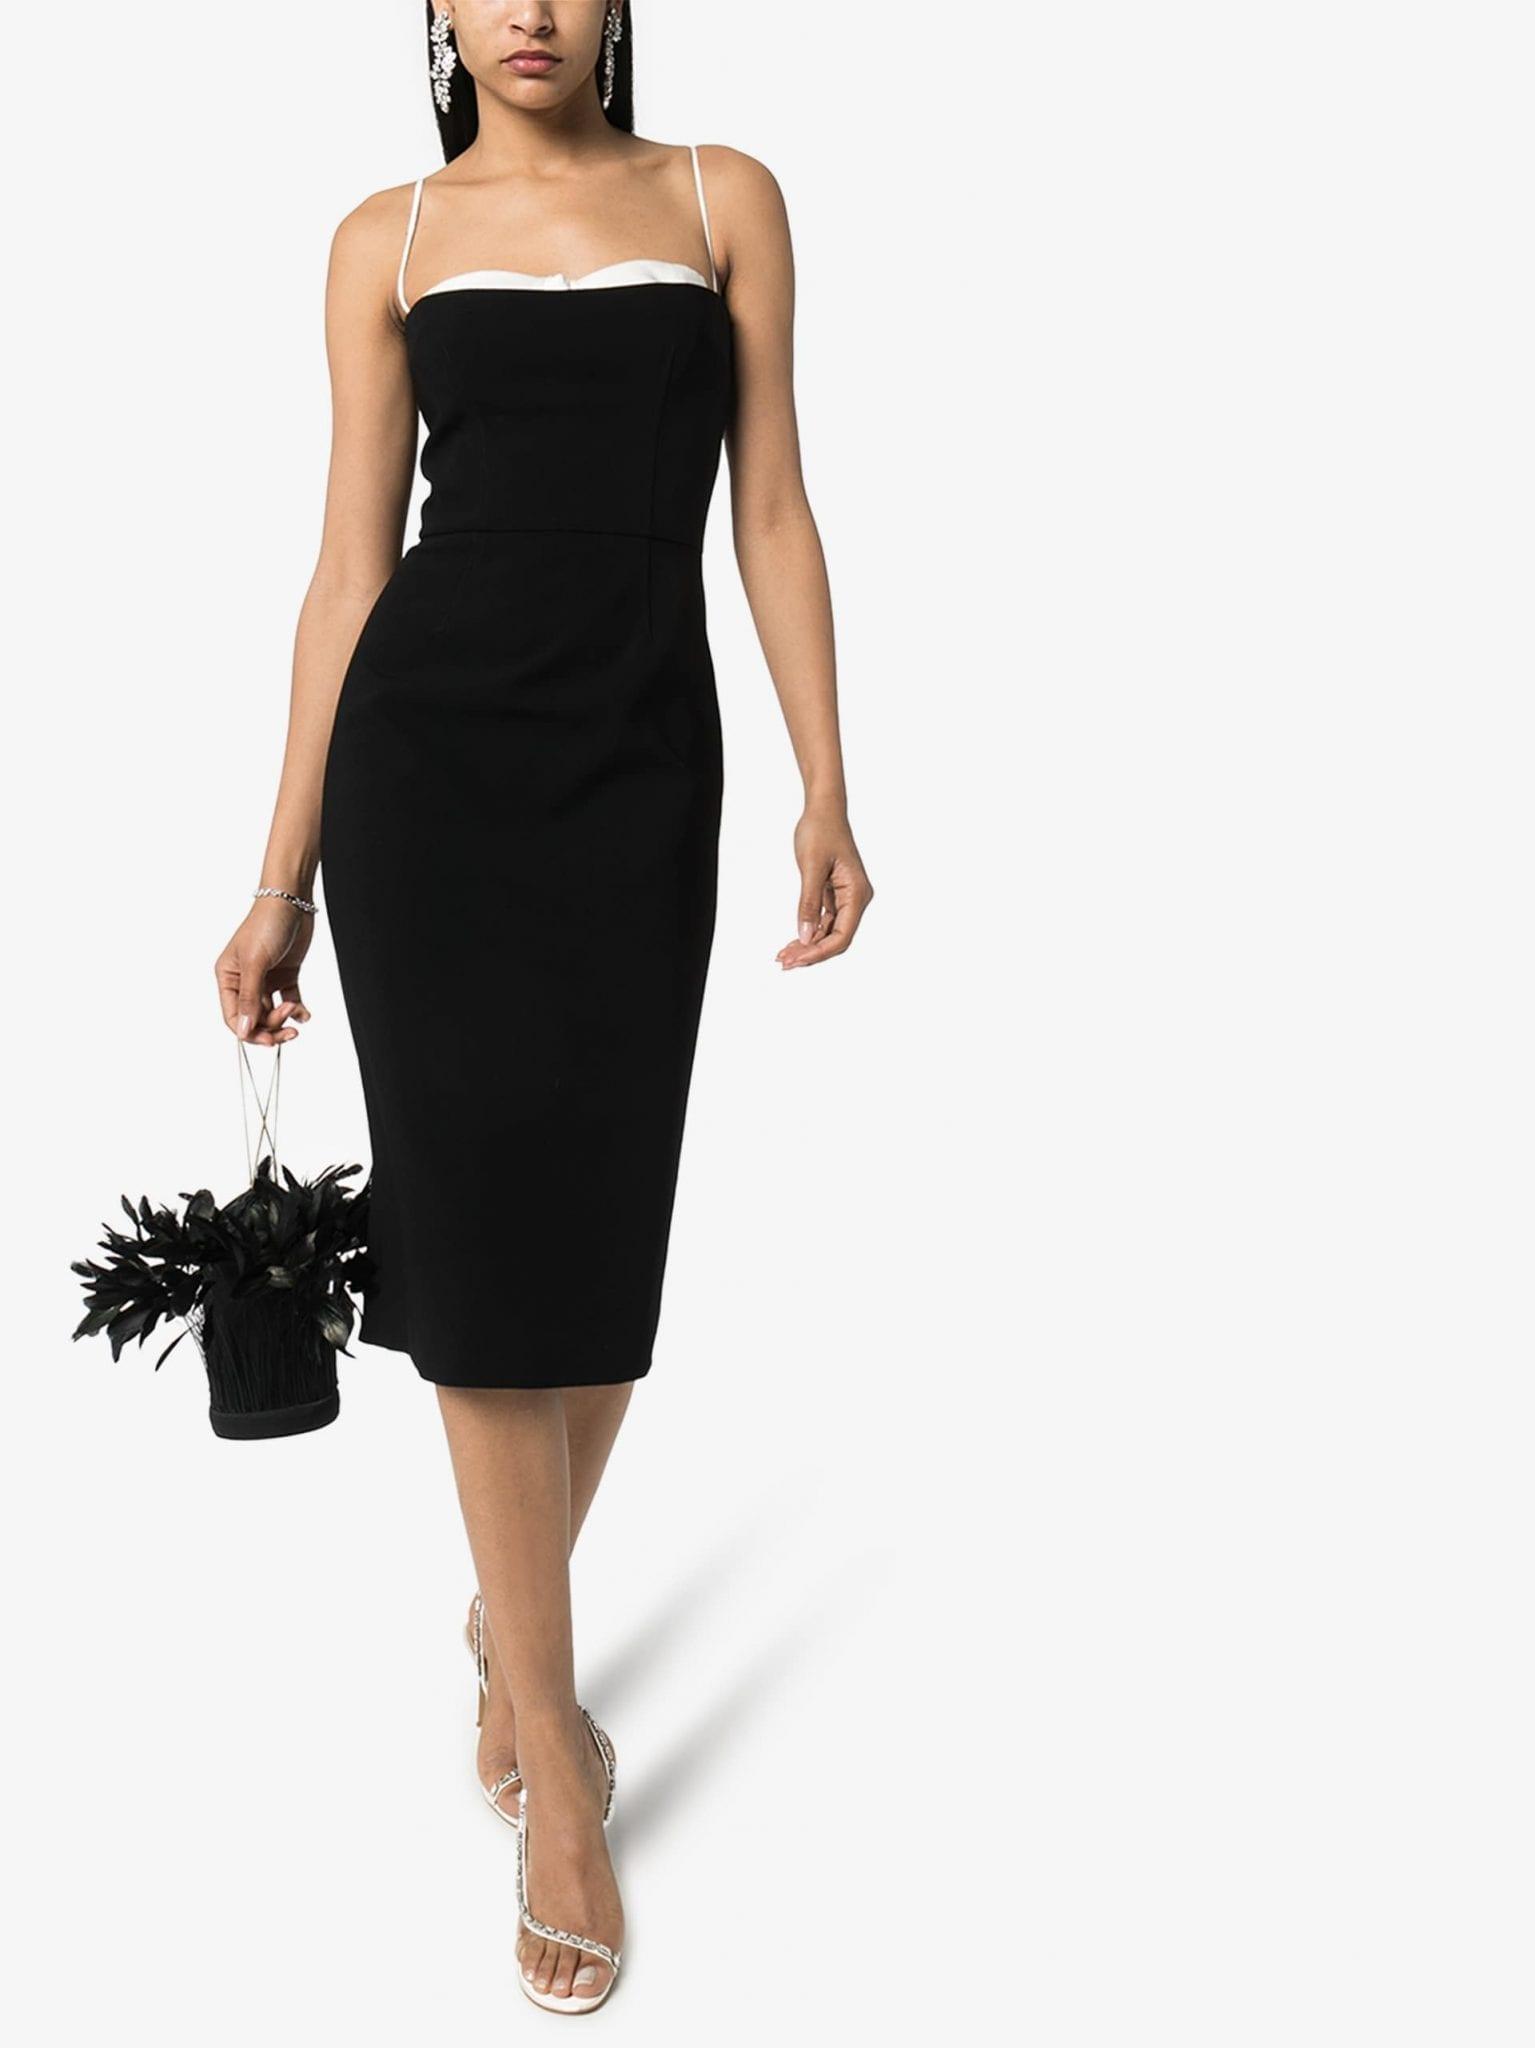 HANEY Meg Layered Bustier Dress